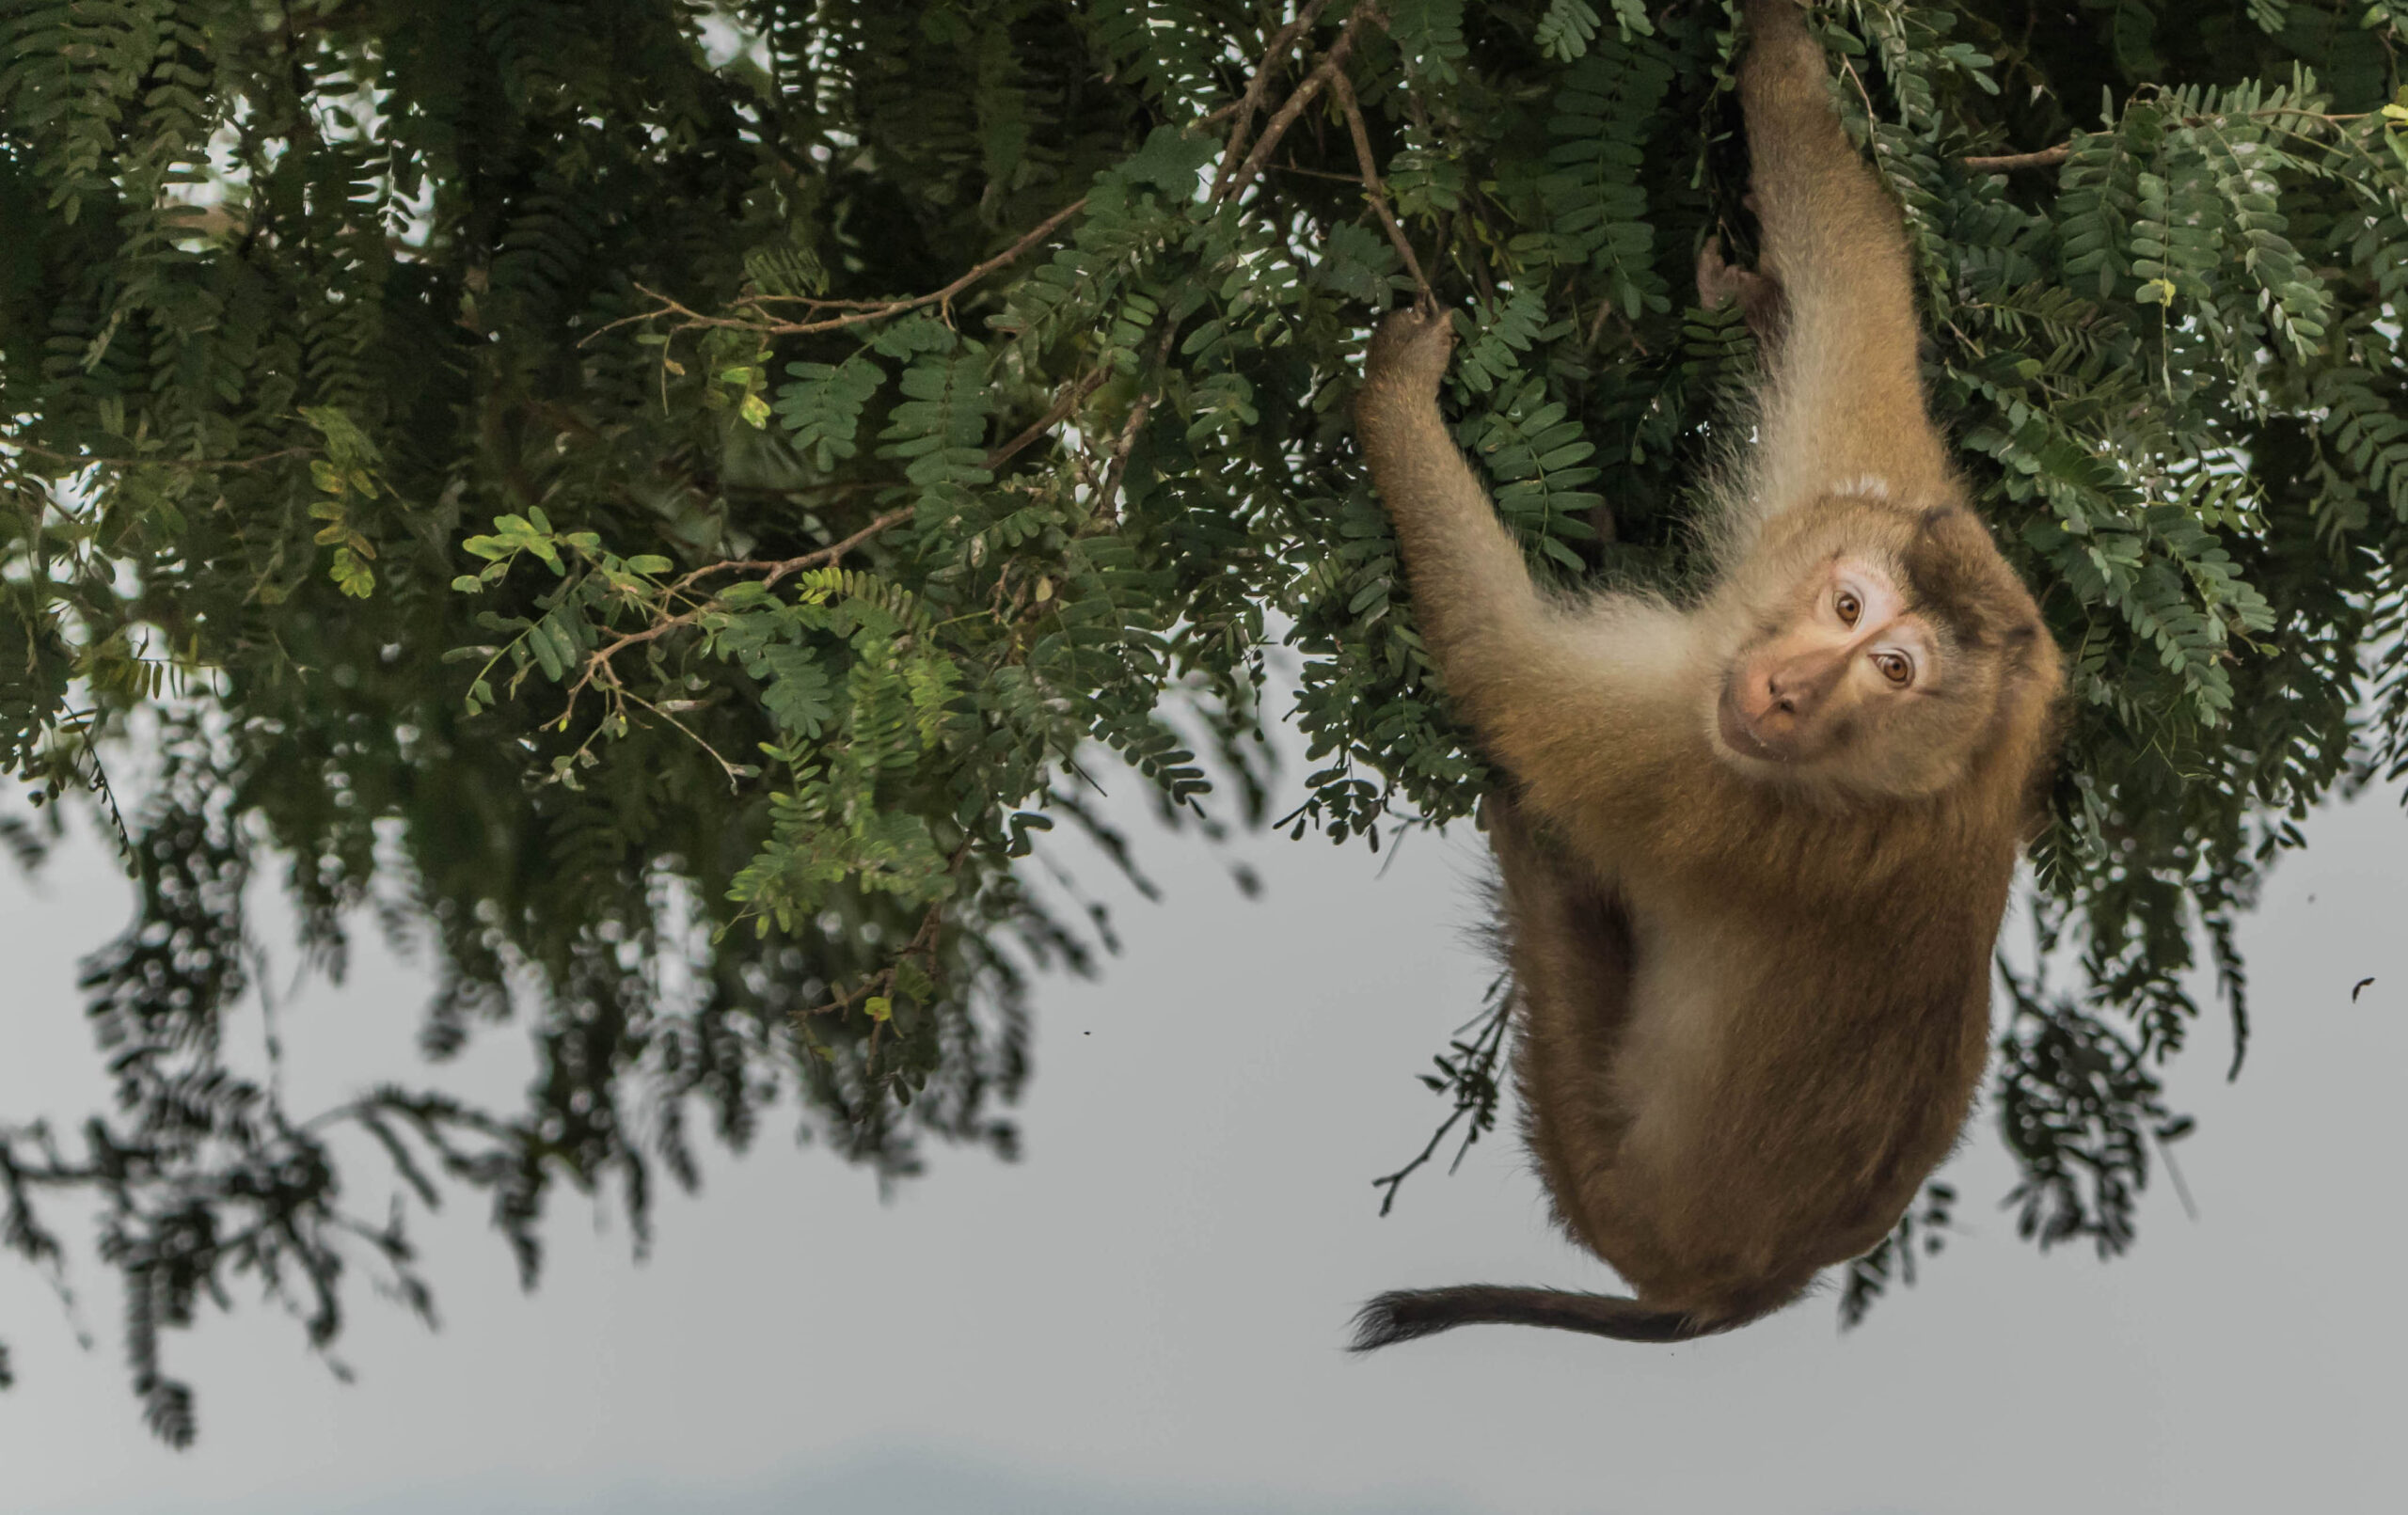 A baby chimpanzee